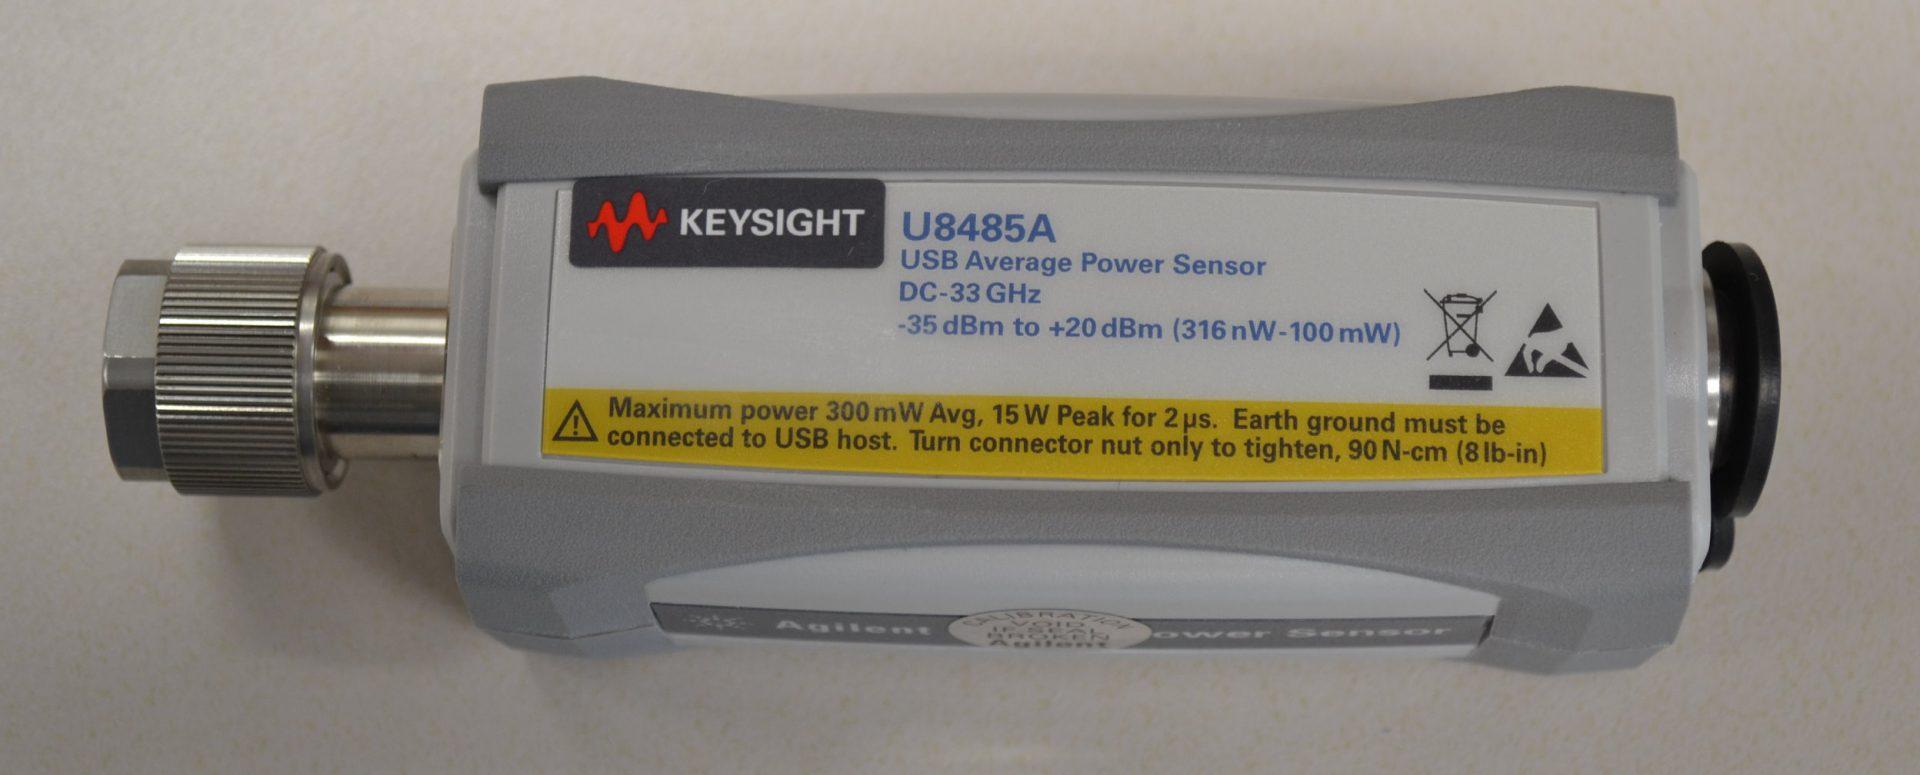 Keysight U8485A Usb Thermocouple Power Sensor